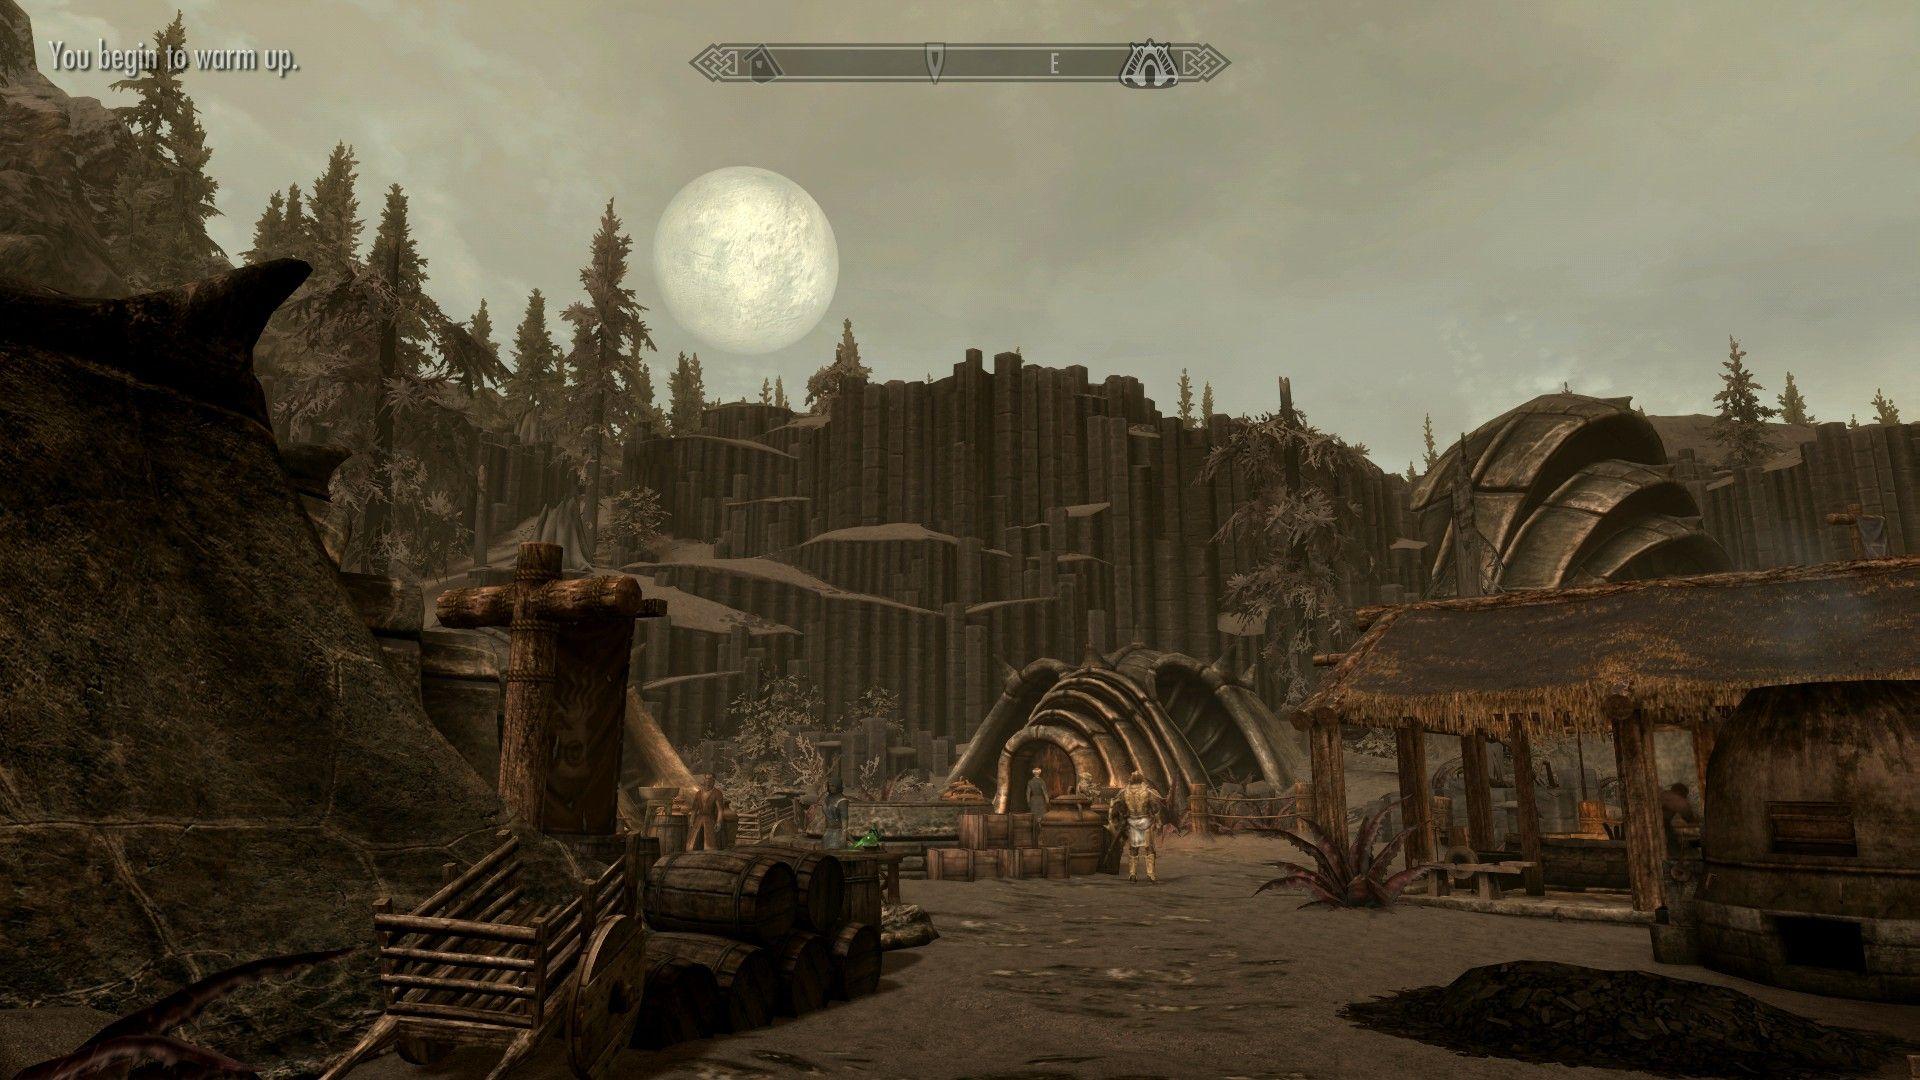 Embla Ysmir Ericsdotter touring Solstheim Morrowind